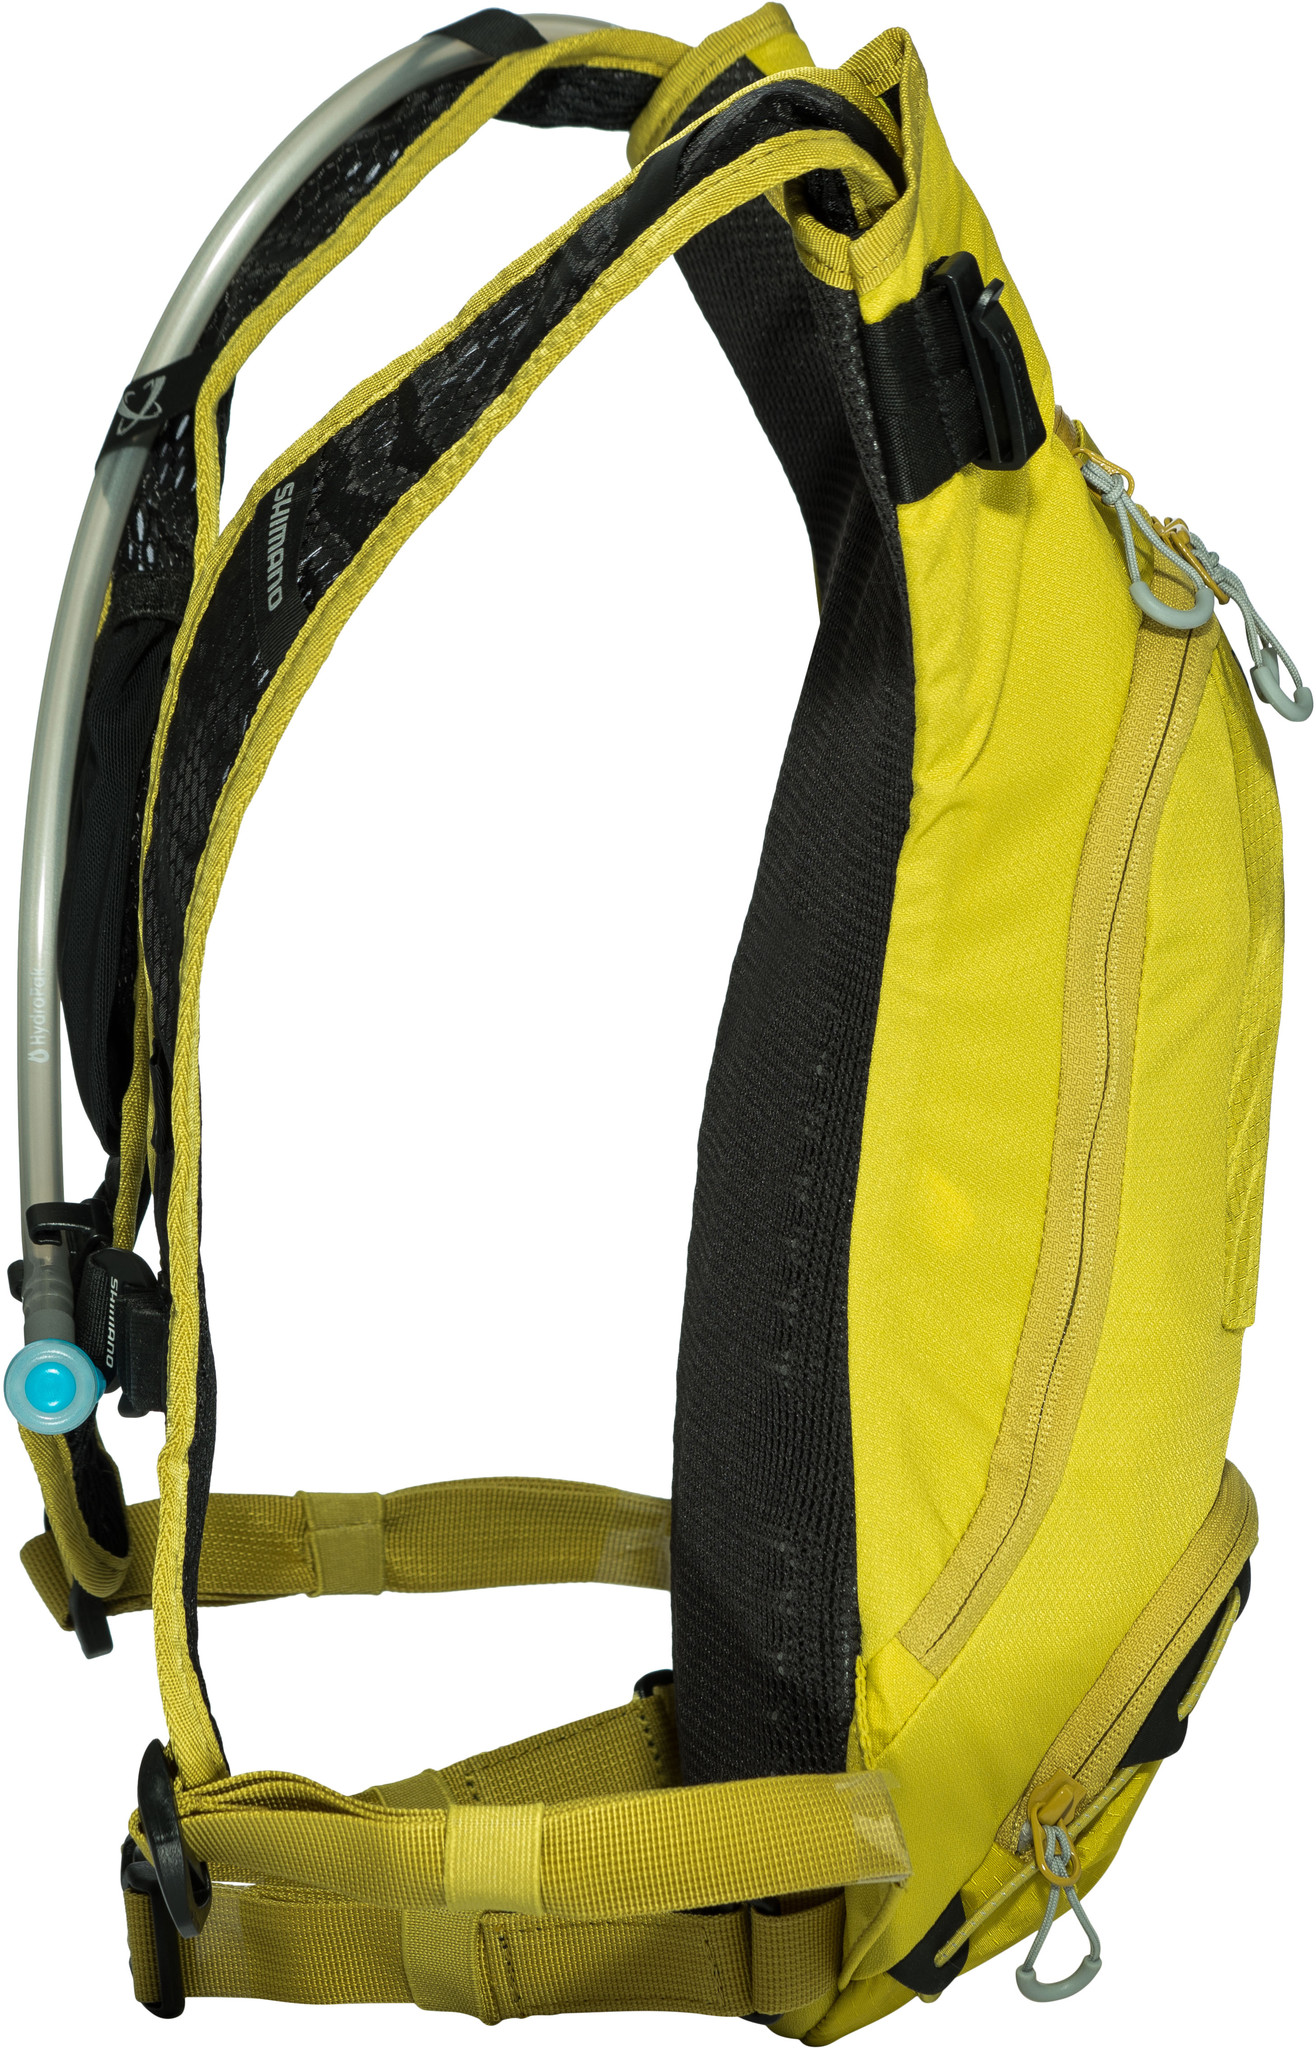 Shimano BAGS BACKPACK SHIMANO UNZEN 2 W/ RESERVOIR OLIVE